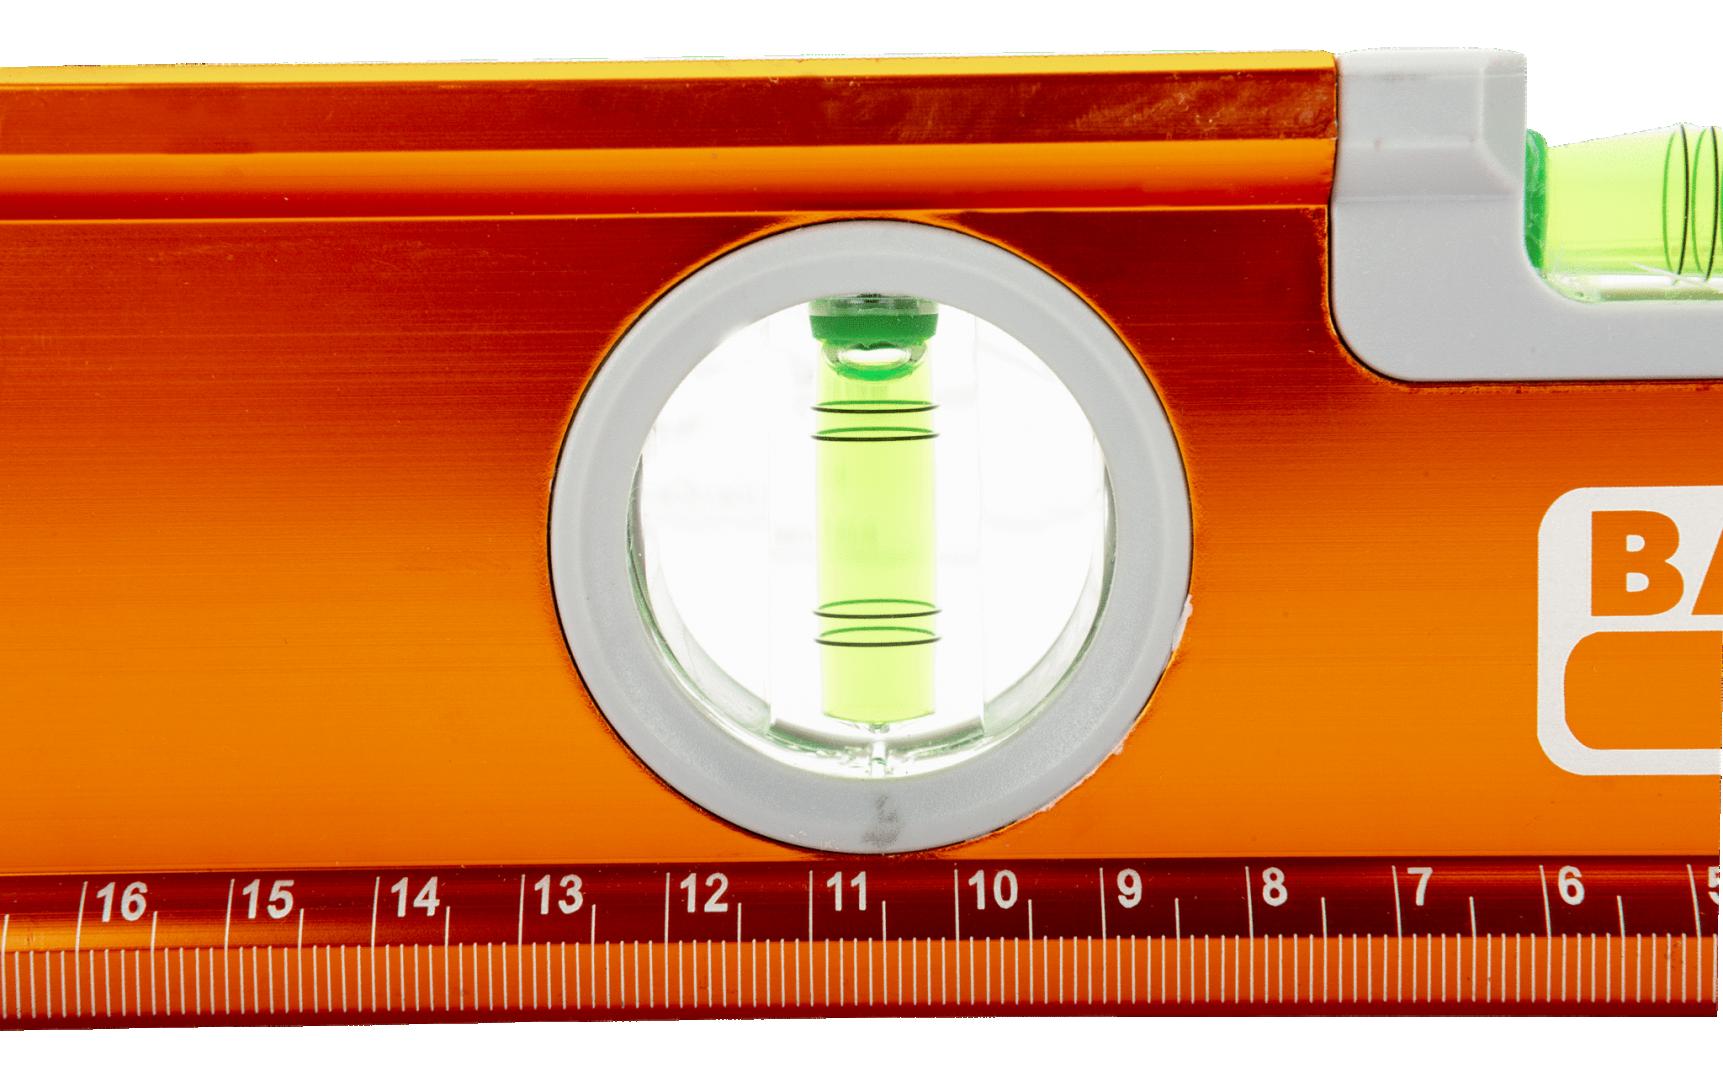 Poziomica 1000 mm aluminiowa, anodowana Bahco (nr kat. 466-1000)